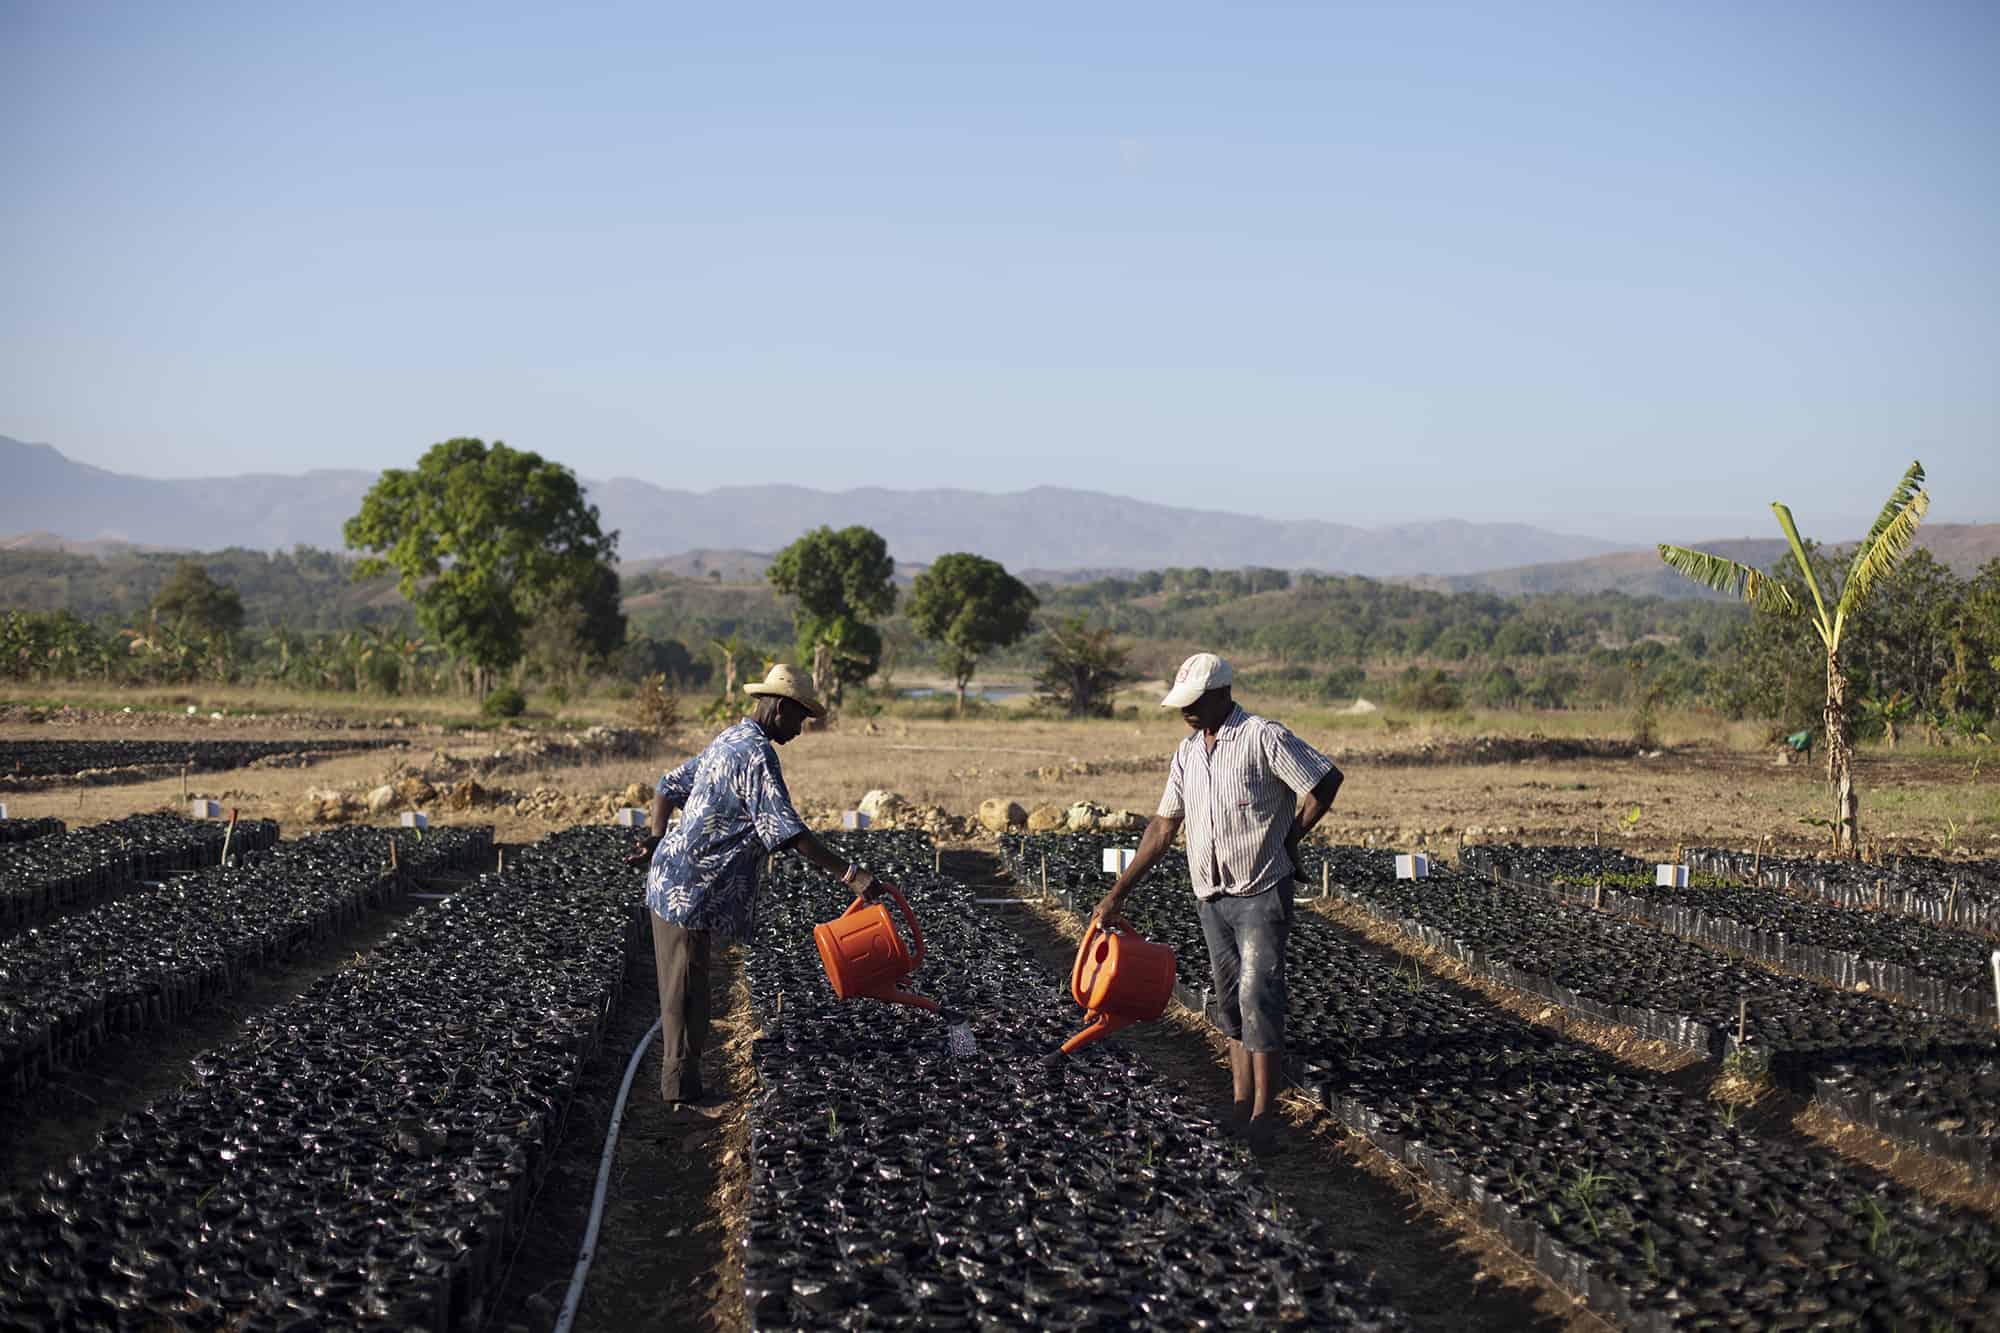 Two farmers water plants in the Nursery of Acceso Haiti, near Mirebalais, Haiti.